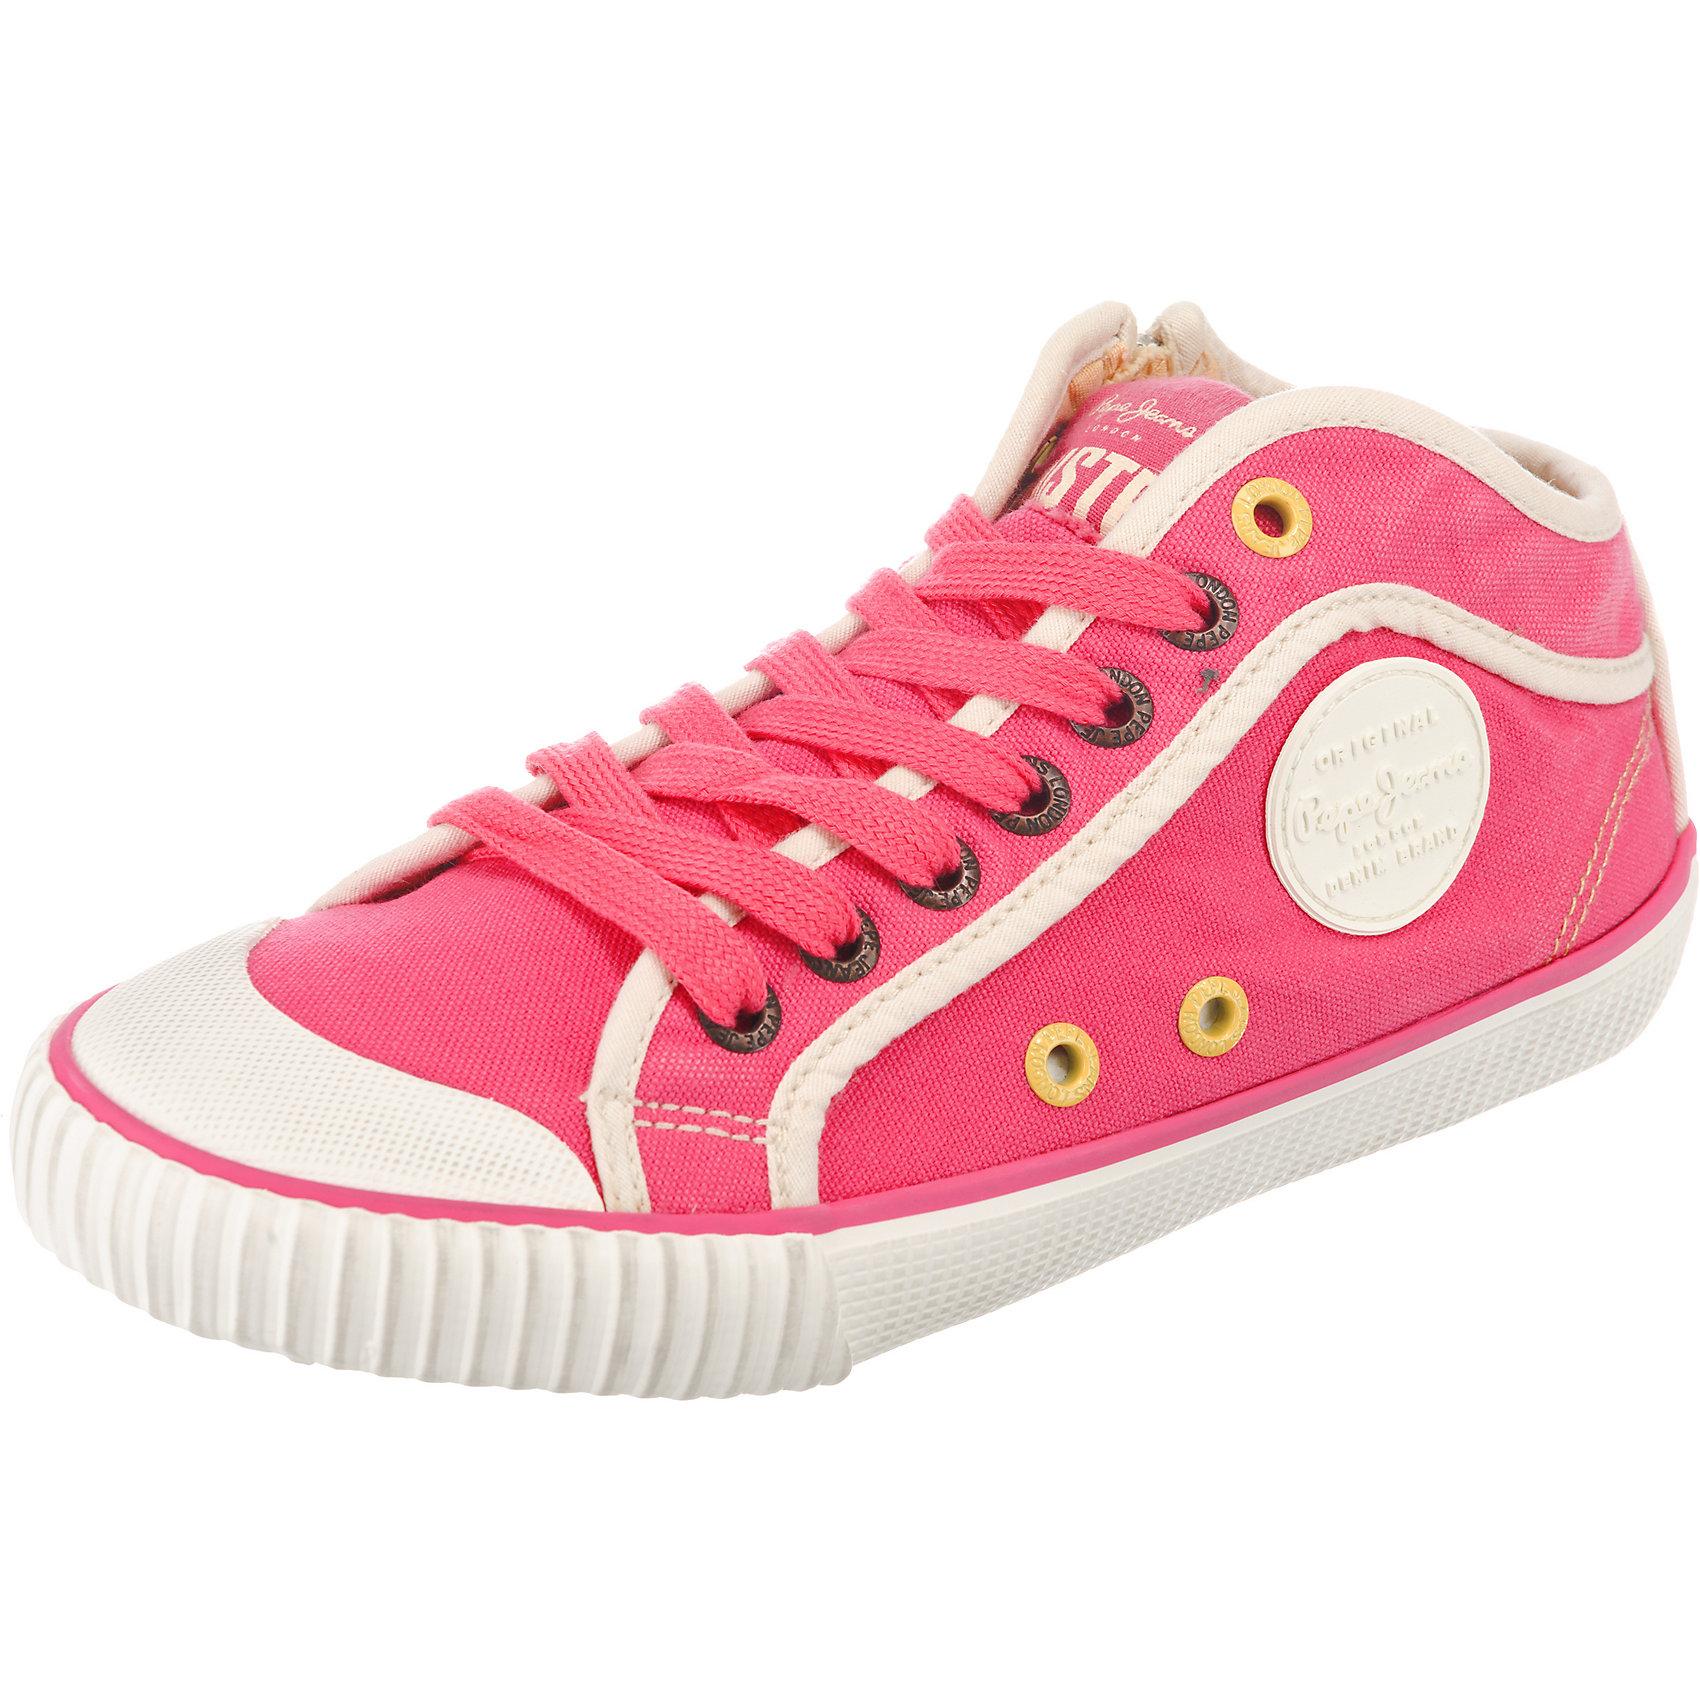 Neu Pepe Jeans INDUSTRY BASIC 17 Sneakers High 7208205 für Damen pink